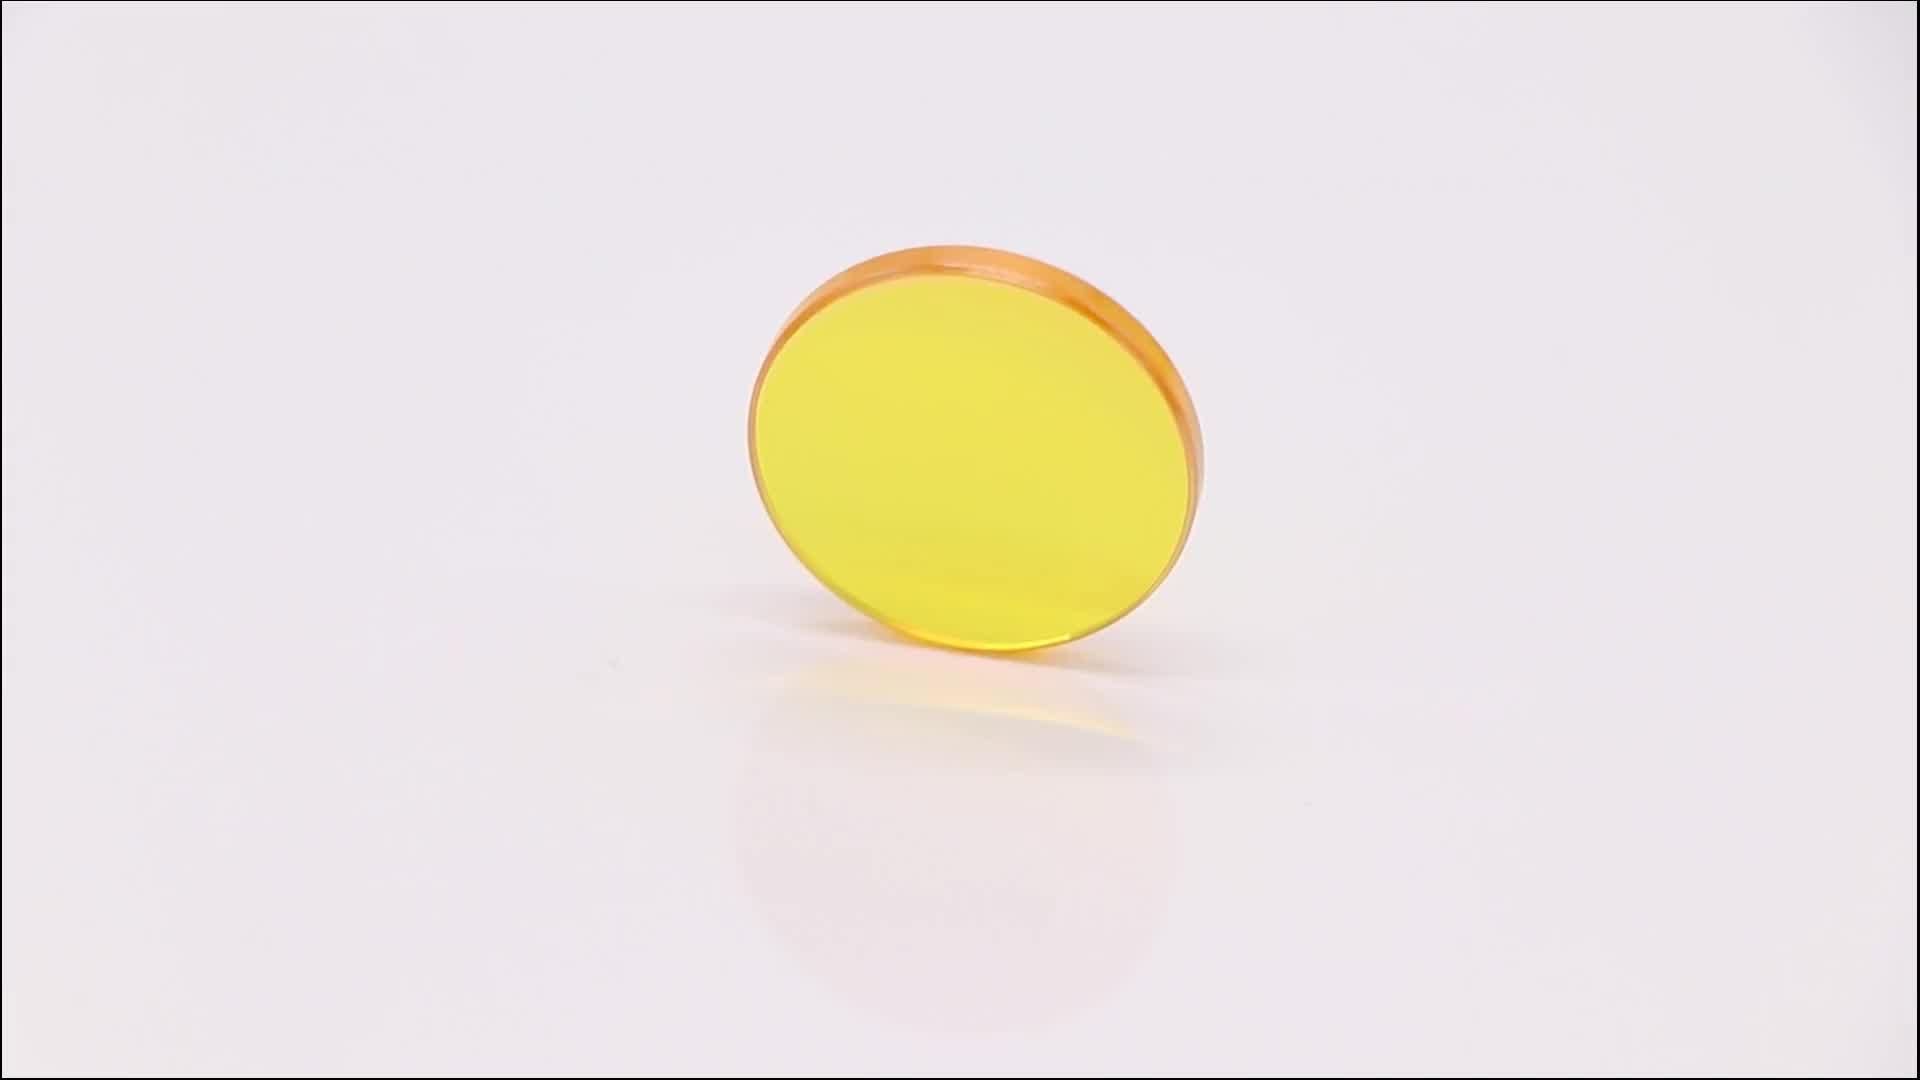 Rekabetçi Fiyat ABD Znse Fiber Lazer odak lensi Diameter15mm FT25.4mm Lazer Makinesi Kaliteli